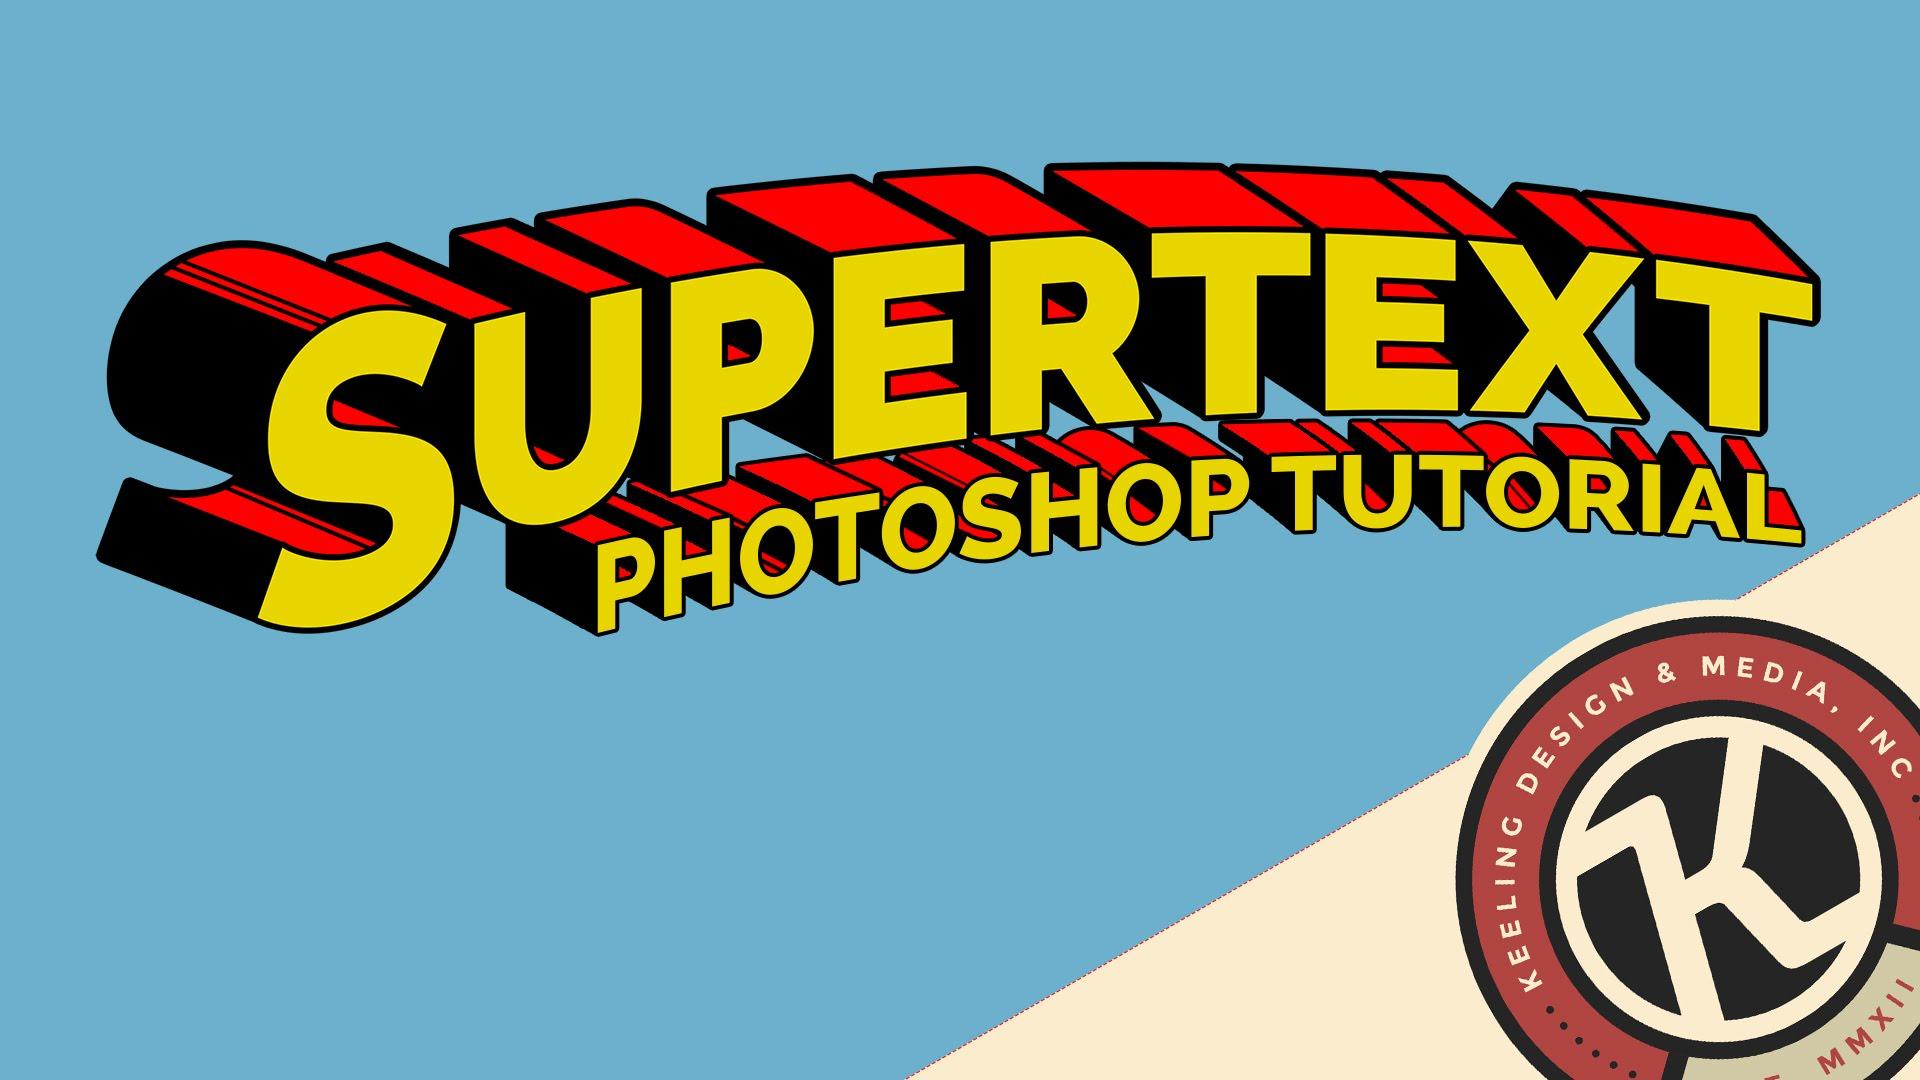 Typeface clipart superman Photoshop Tutorial: YouTube Supertext Photoshop